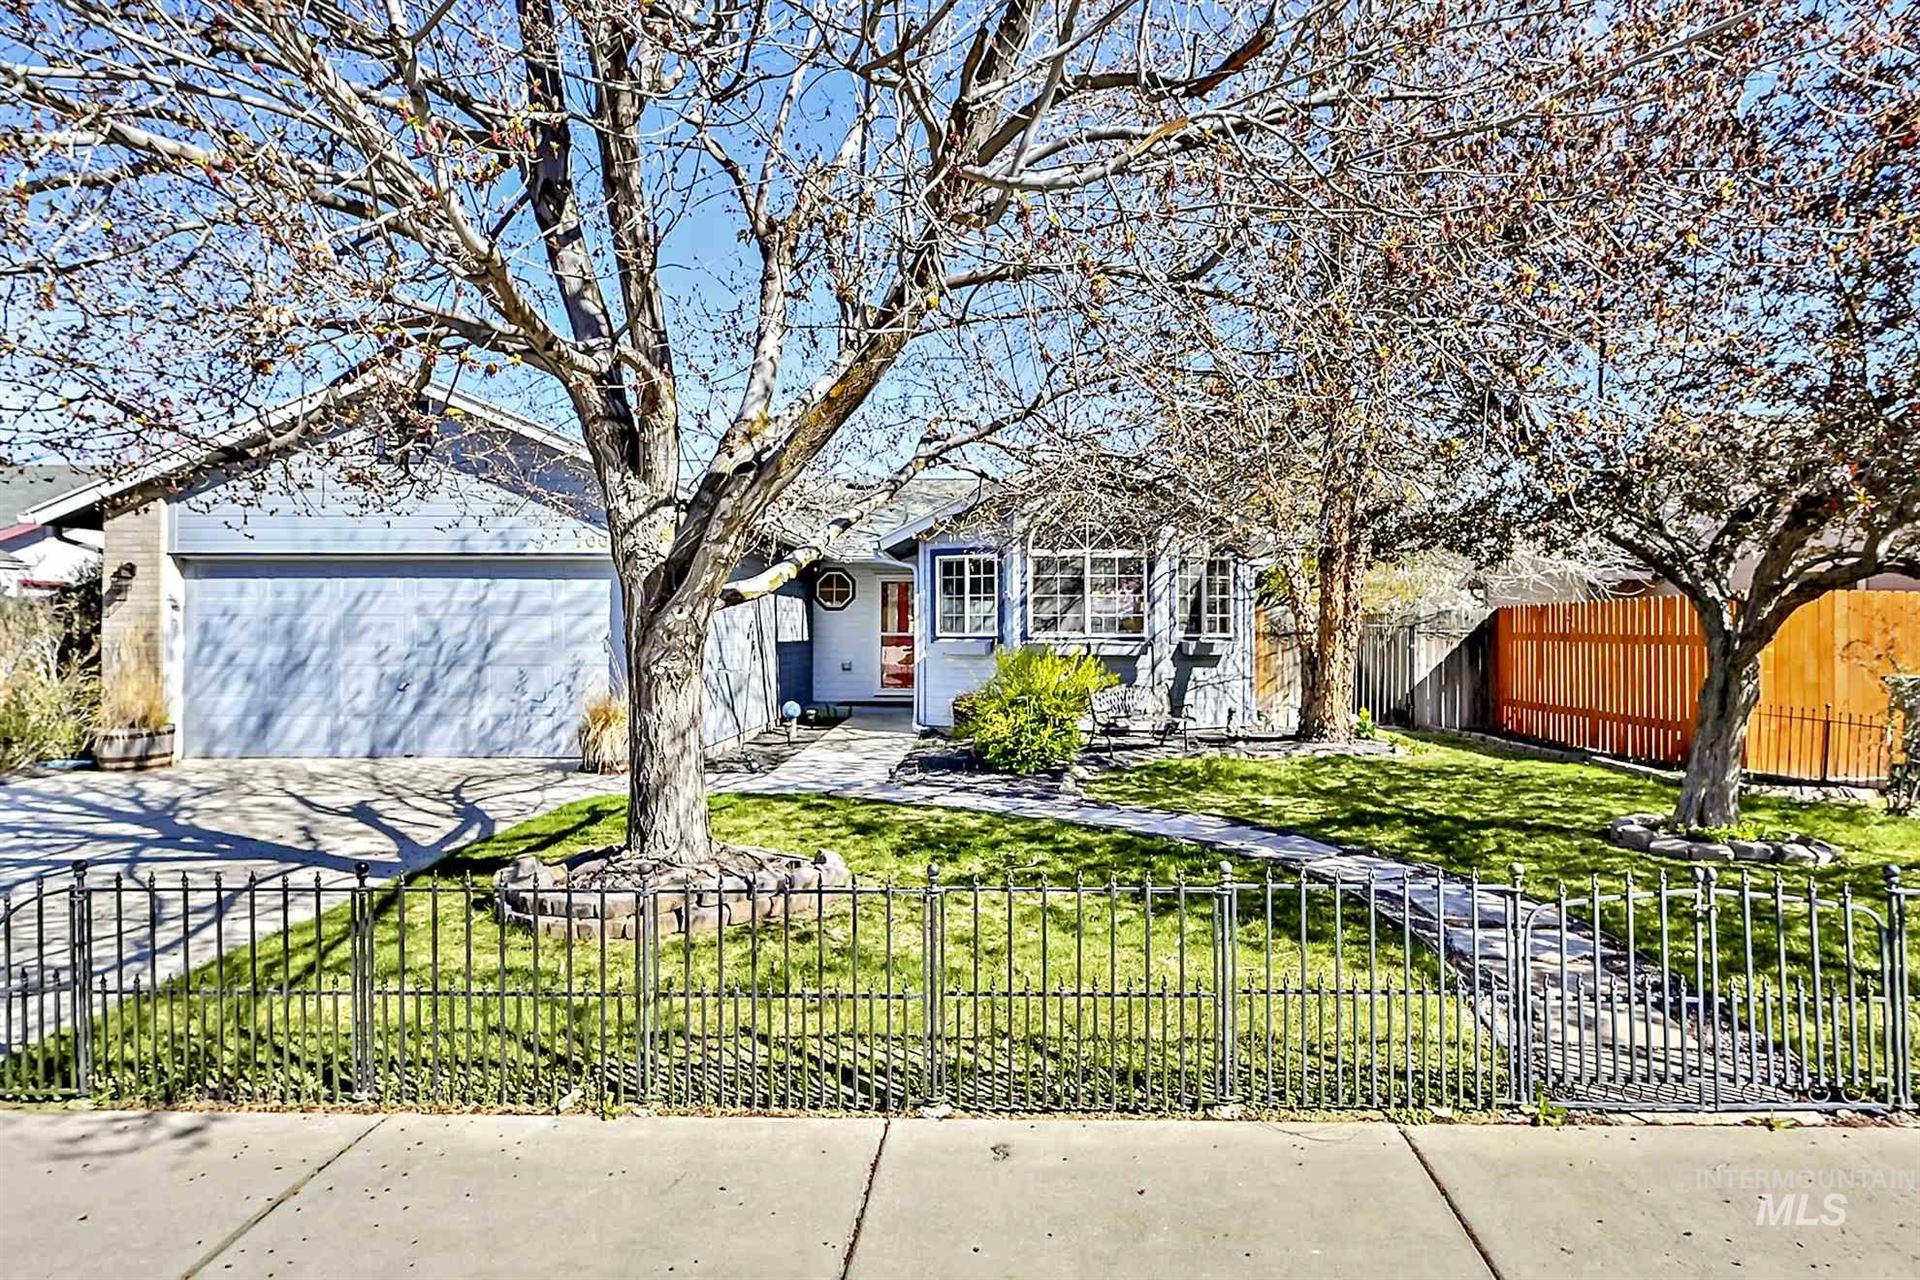 Photo of 7008 W Stratton, Boise, ID 83704-7464 (MLS # 98799239)